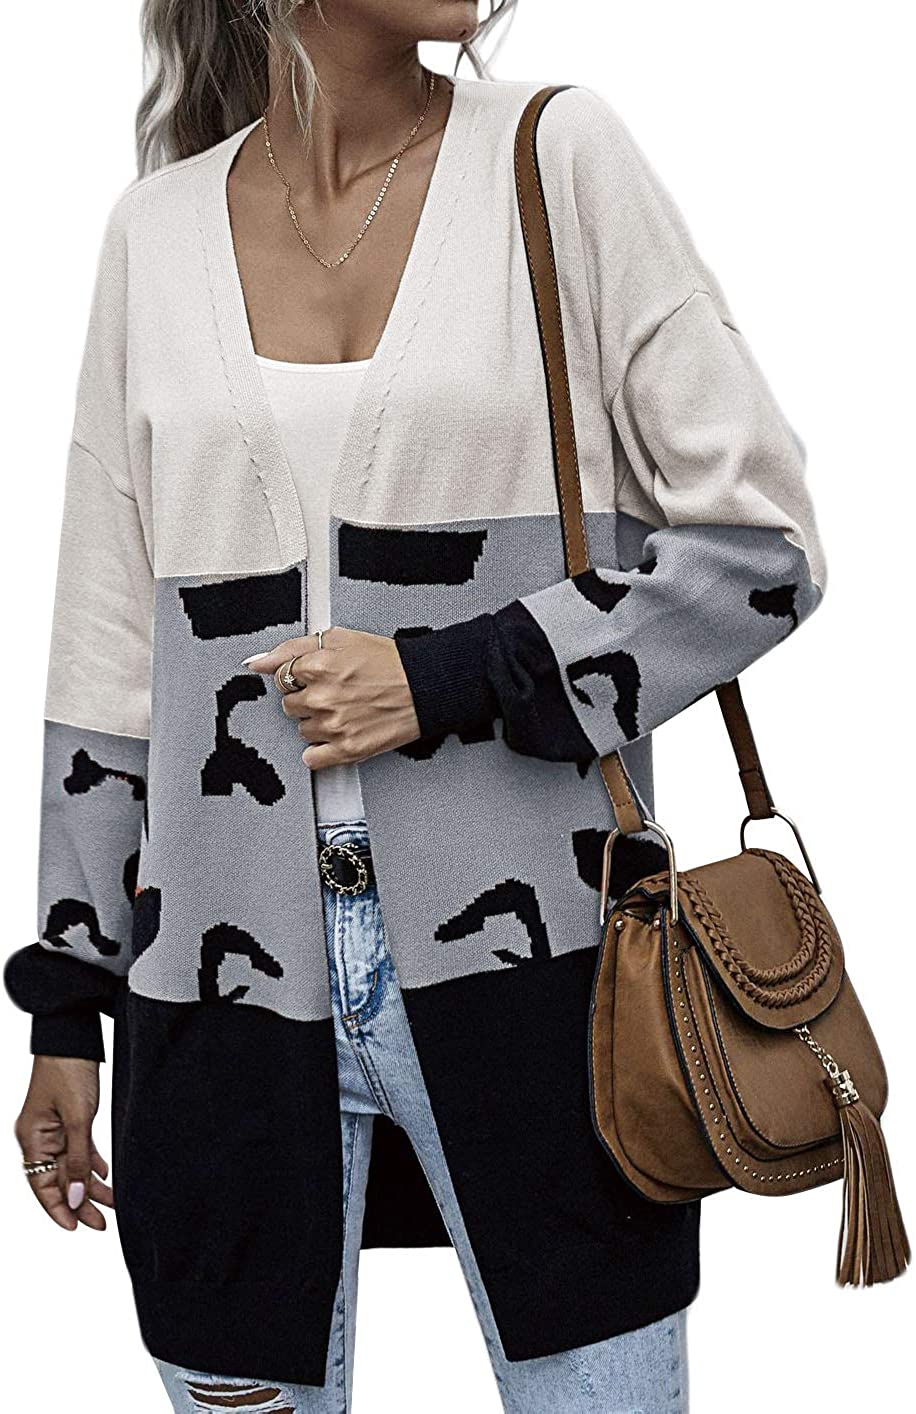 Monland Sweater Women's Casual Mid-Length Leopard Print Stitching Cardigan Autumn Winter Sweater Fashion Coat Coffee S Size